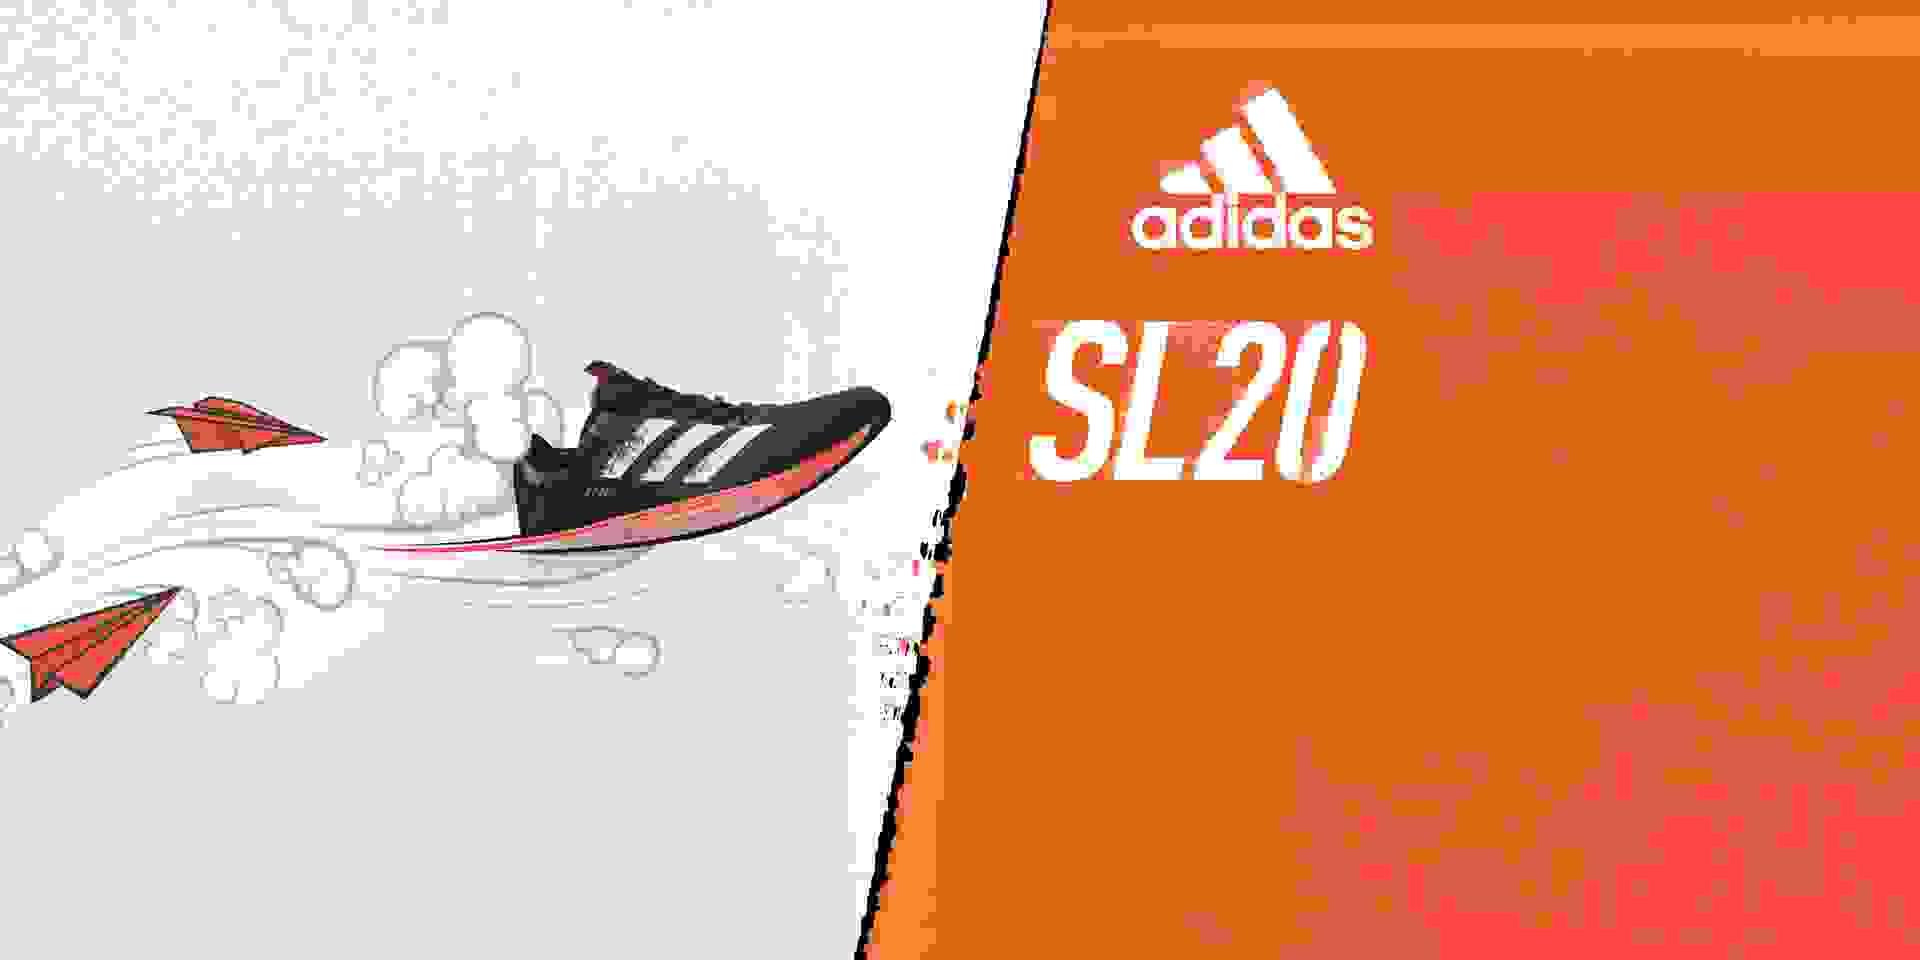 Adidas Faster than Kollektion